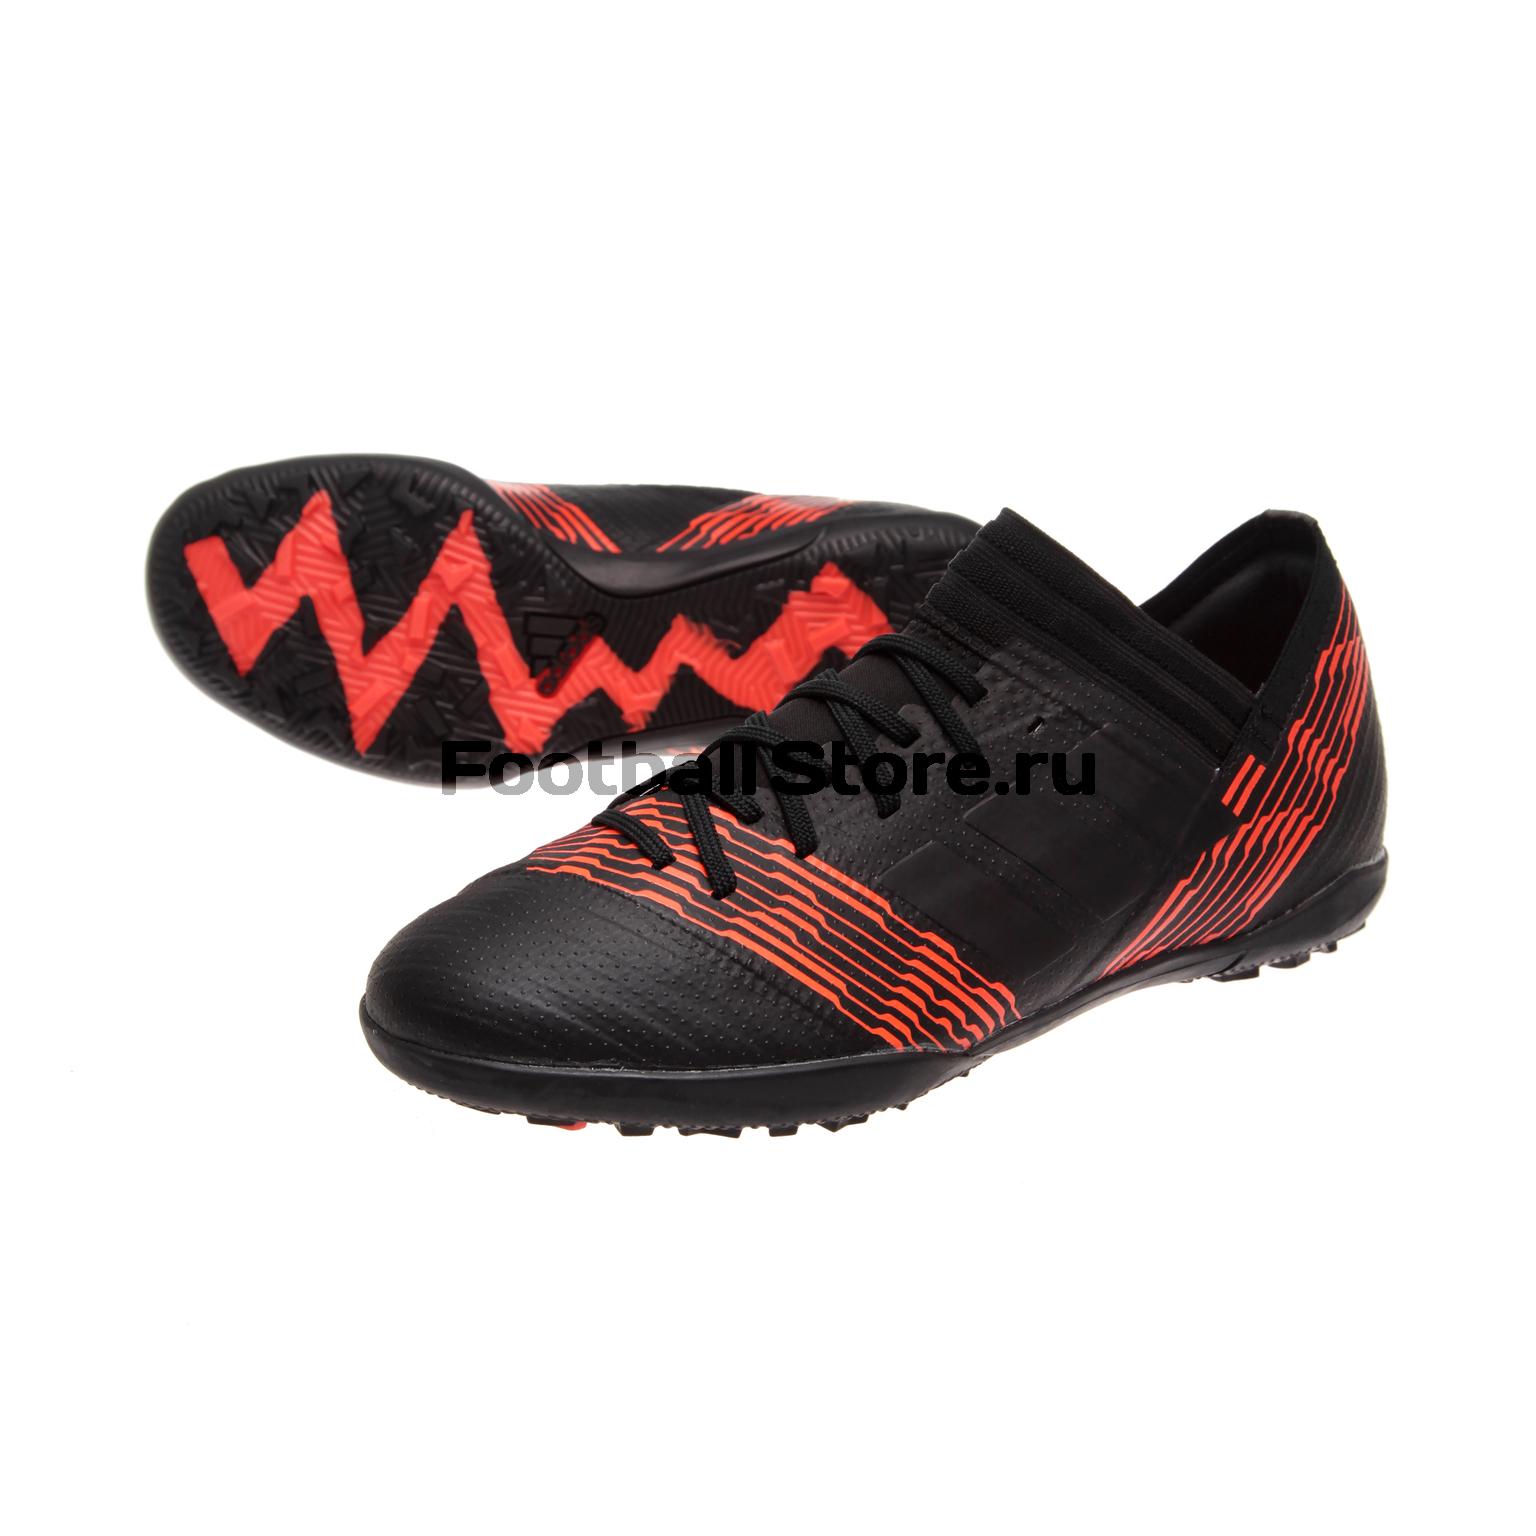 Шиповки Adidas Nemeziz Tango 17.3 TF JR CP9237 обувь для зала adidas nemeziz tango 17 3 in jr cp9182